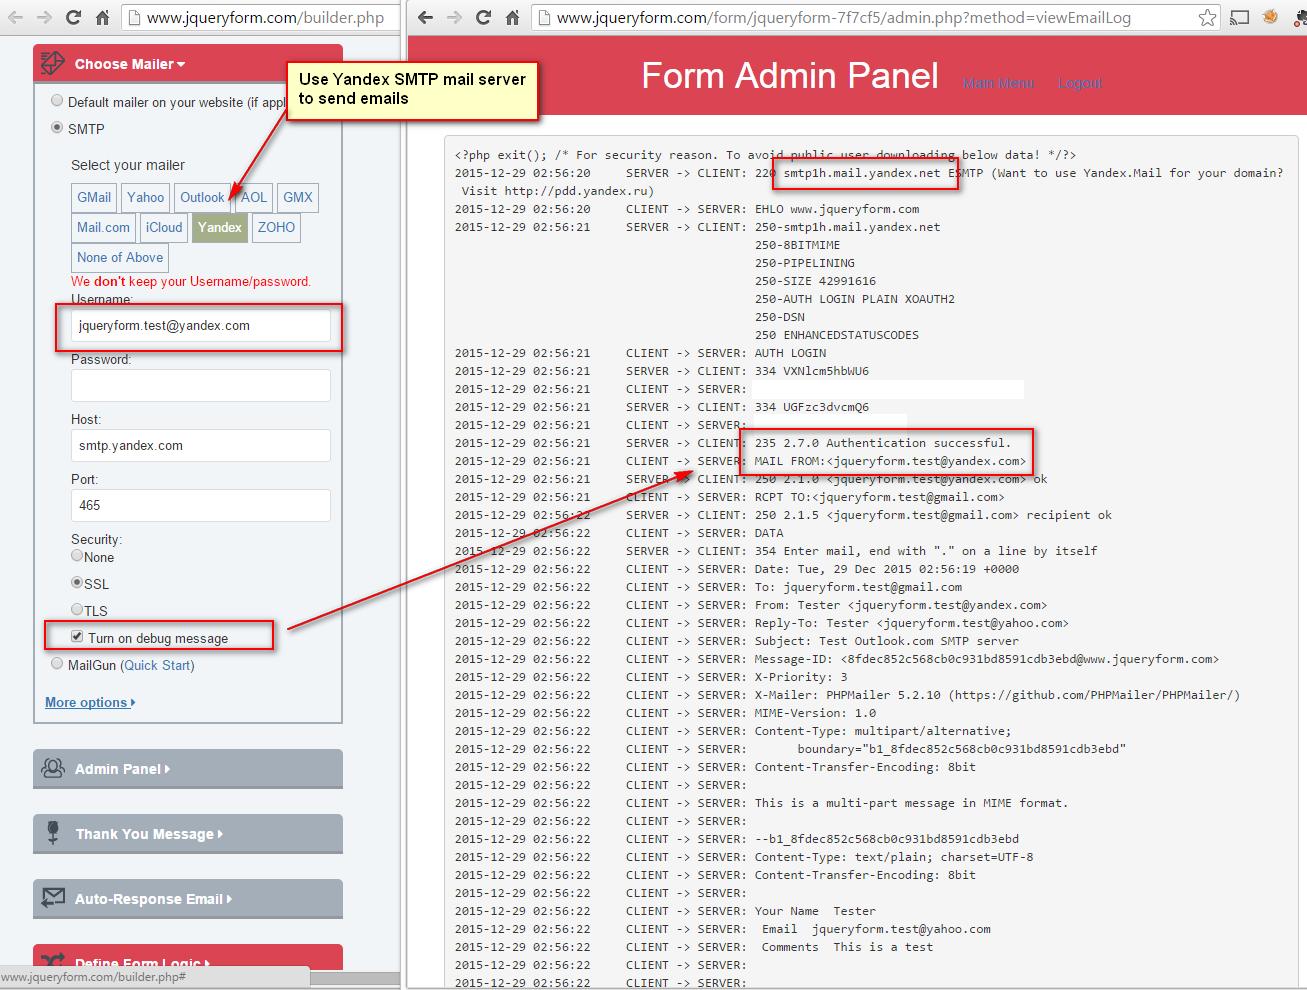 Use Yandex SMTP server to send emails